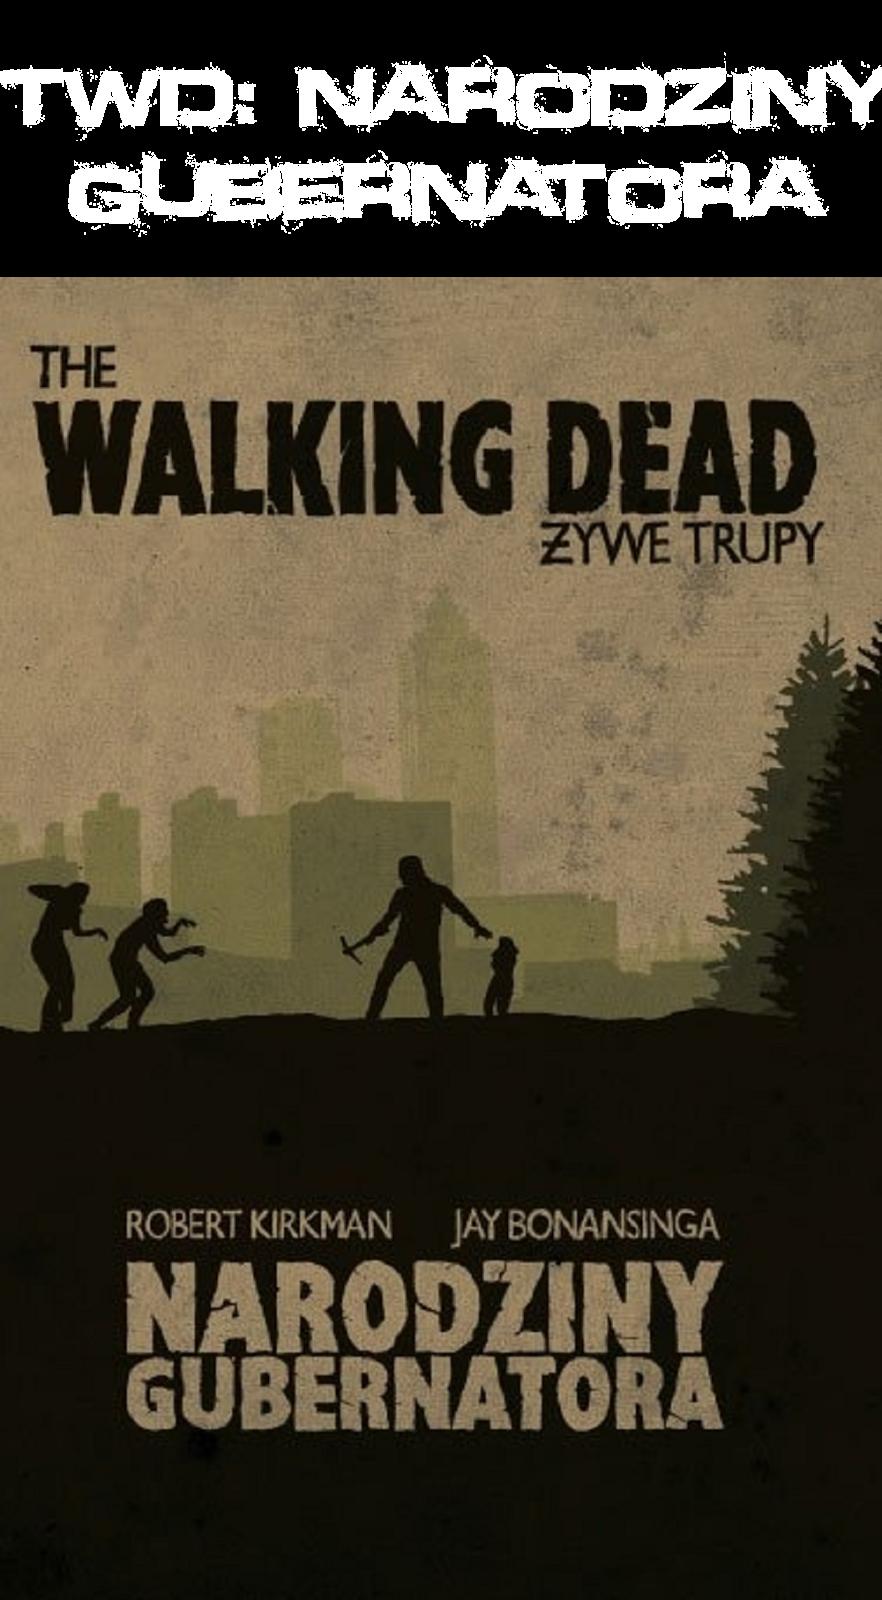 http://radioaktywne-recenzje.blogspot.com/2013/10/the-walking-dead-narodziny-gubernatora.html